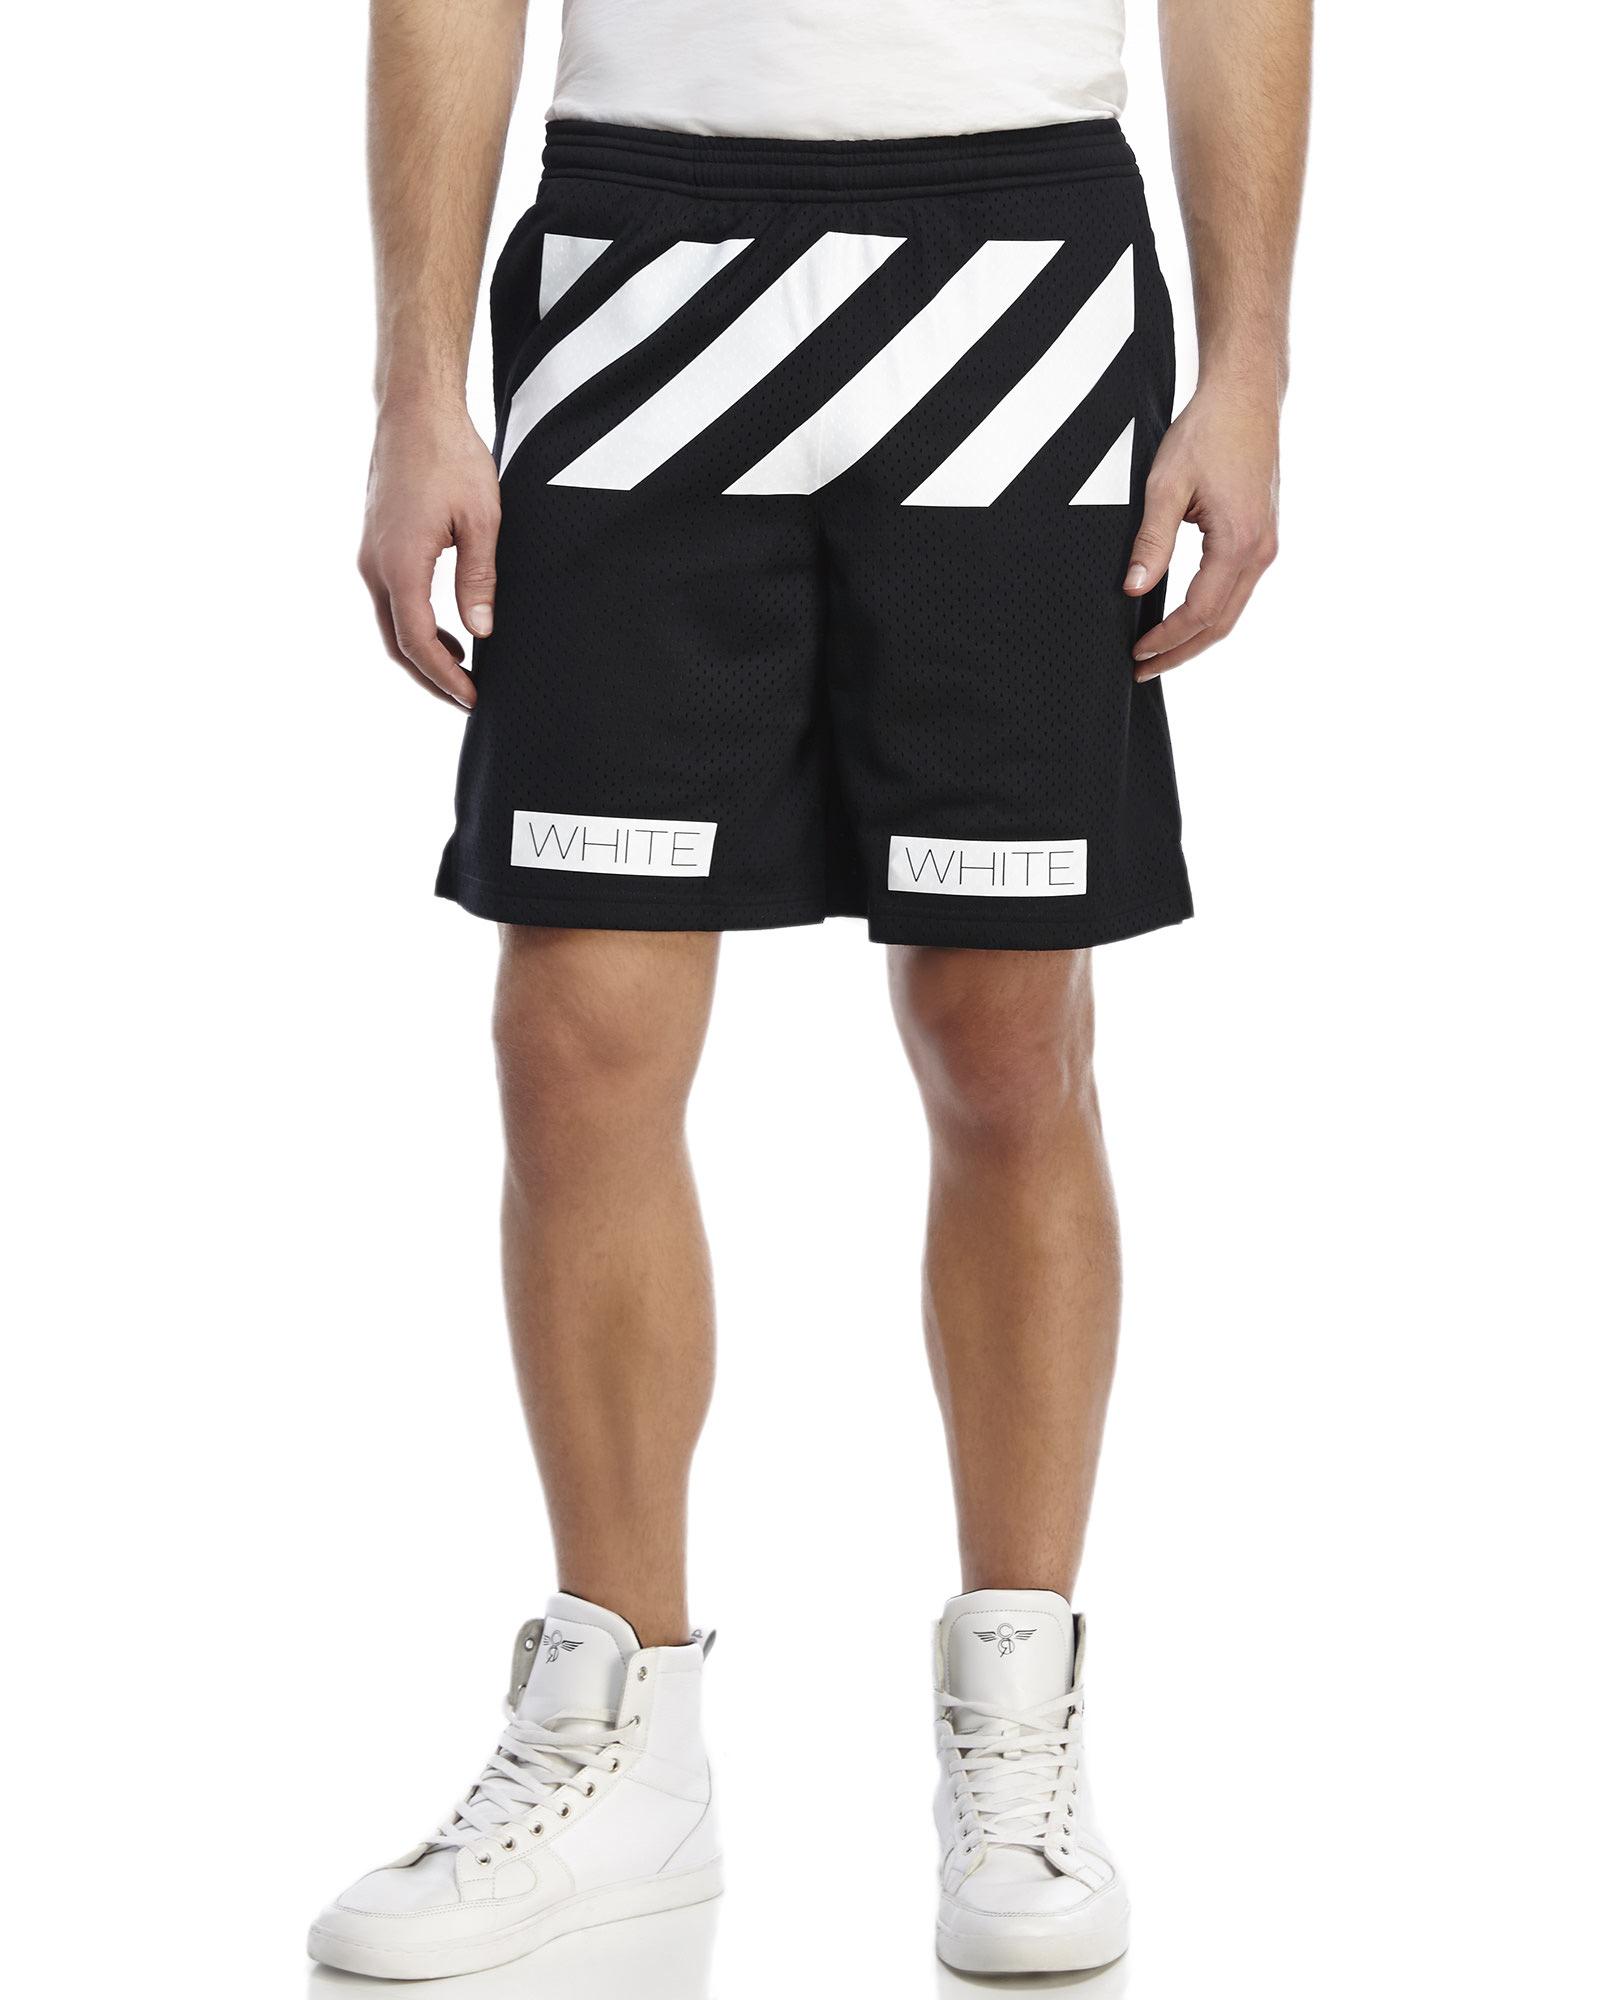 Lyst - Off-White c o Virgil Abloh Striped Mesh Shorts in Black for Men f99f07d21